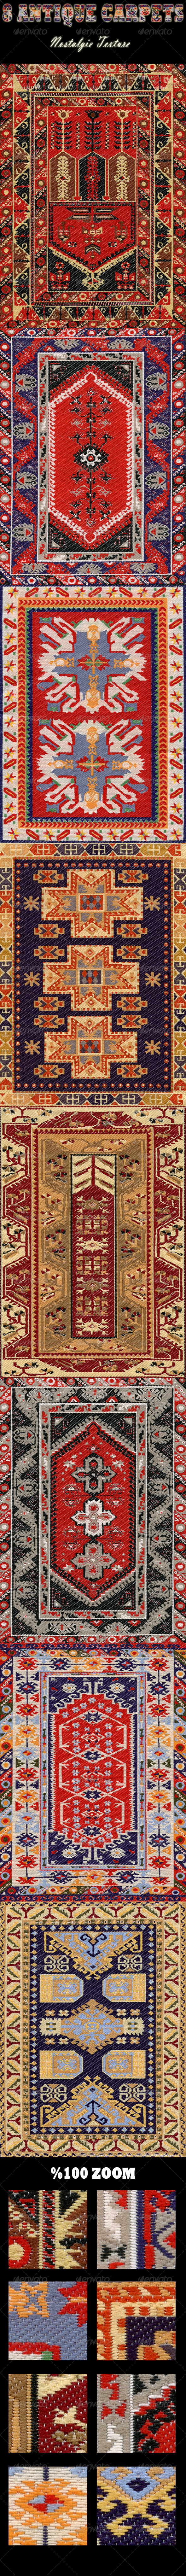 GraphicRiver 8 Antique Carpets Nostalgia Texture 6568878